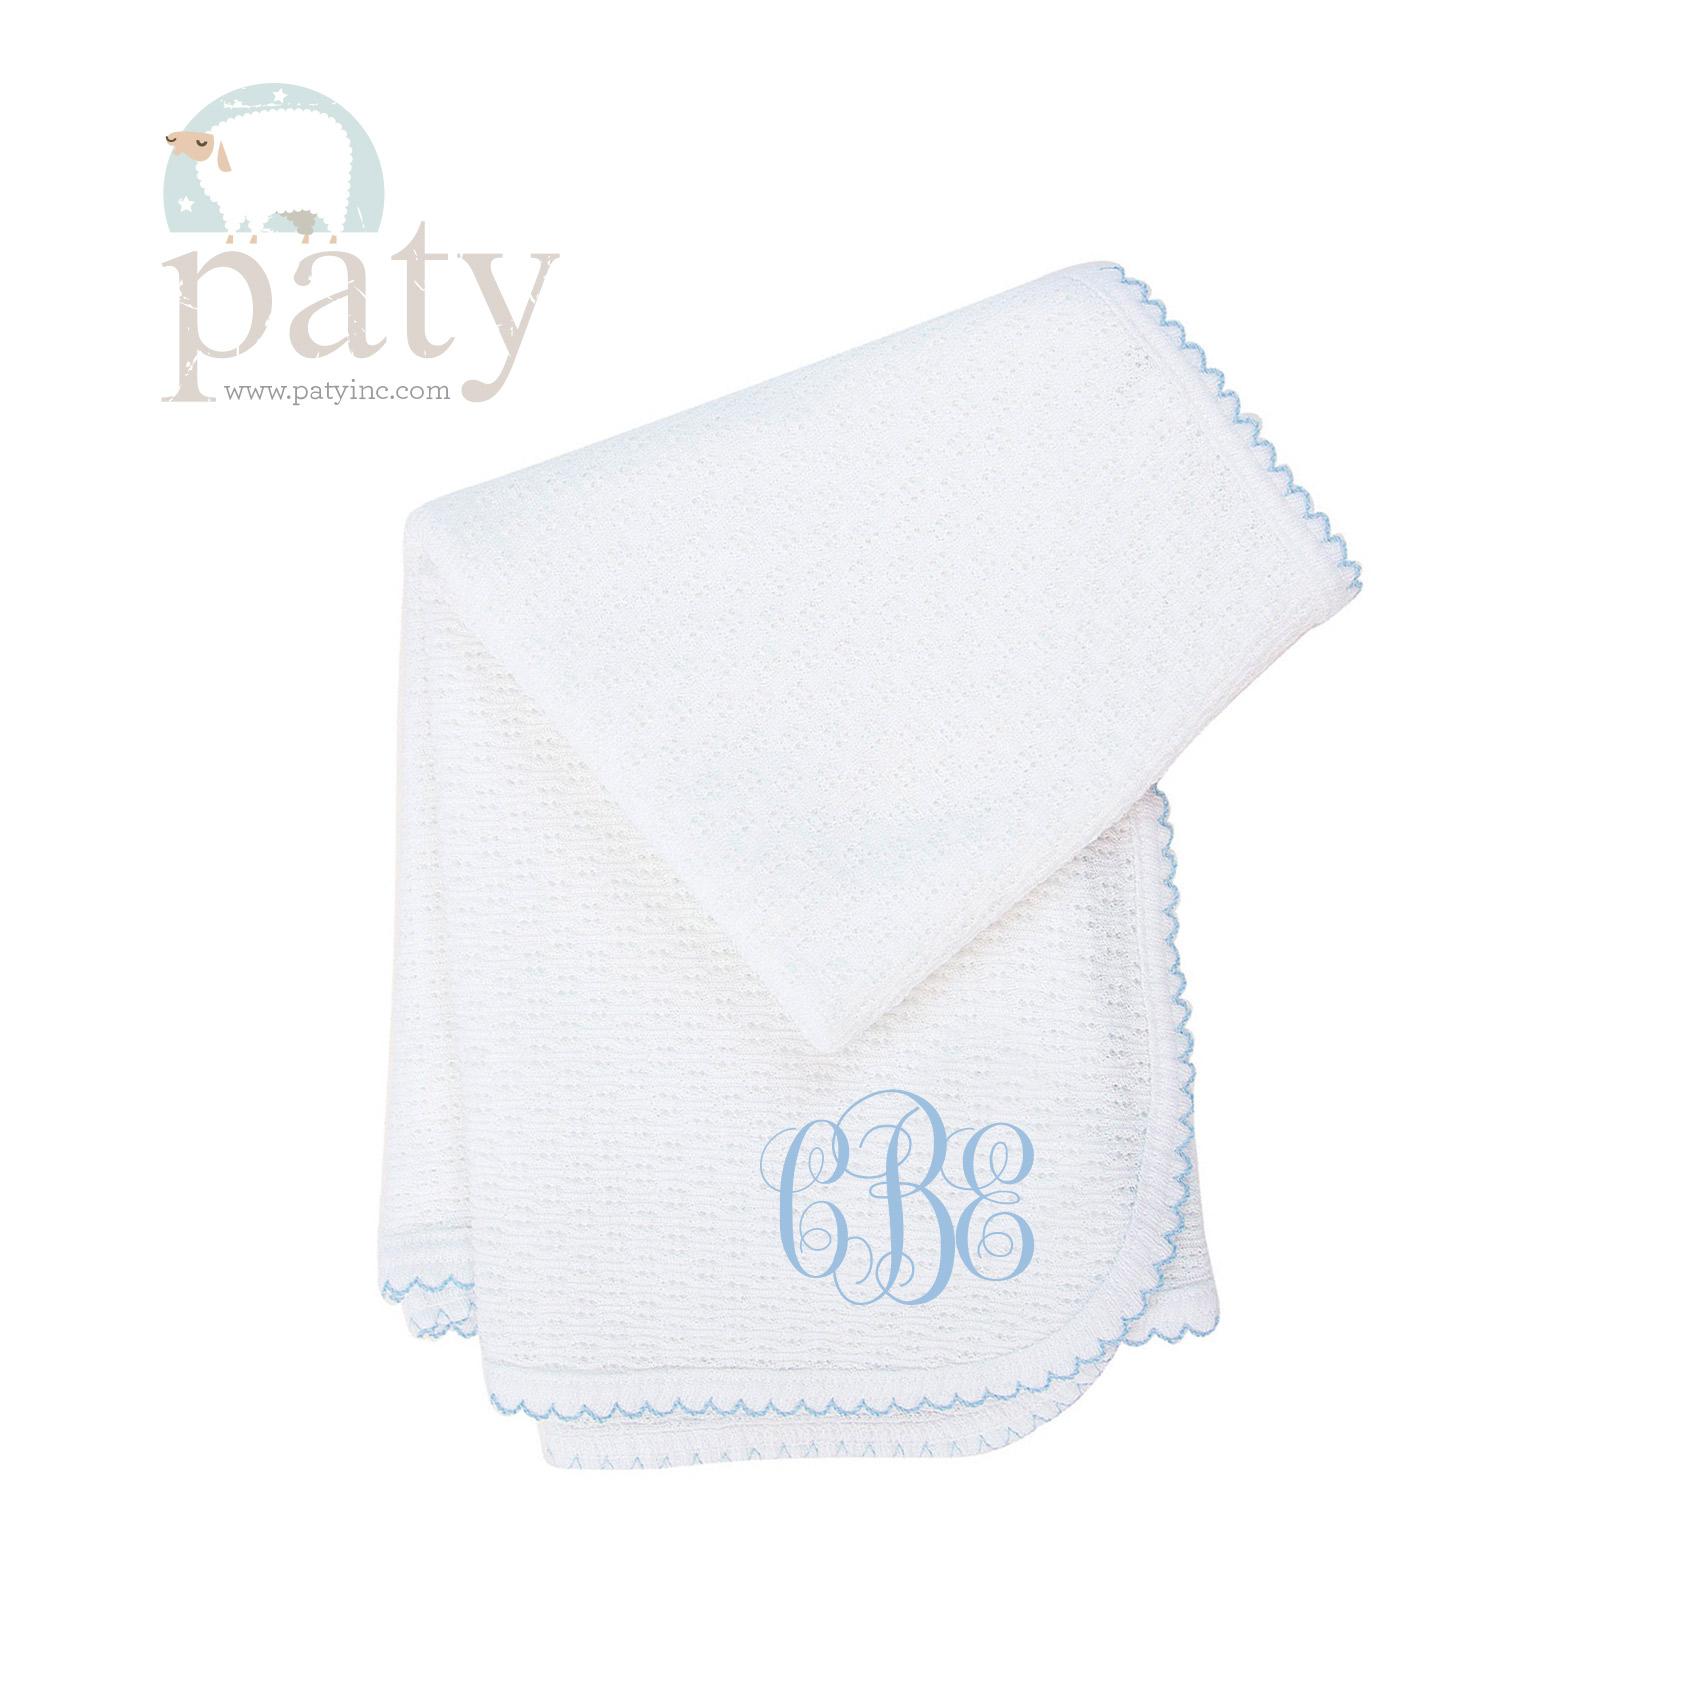 Monogrammed Paty Blanket Interlocking Font